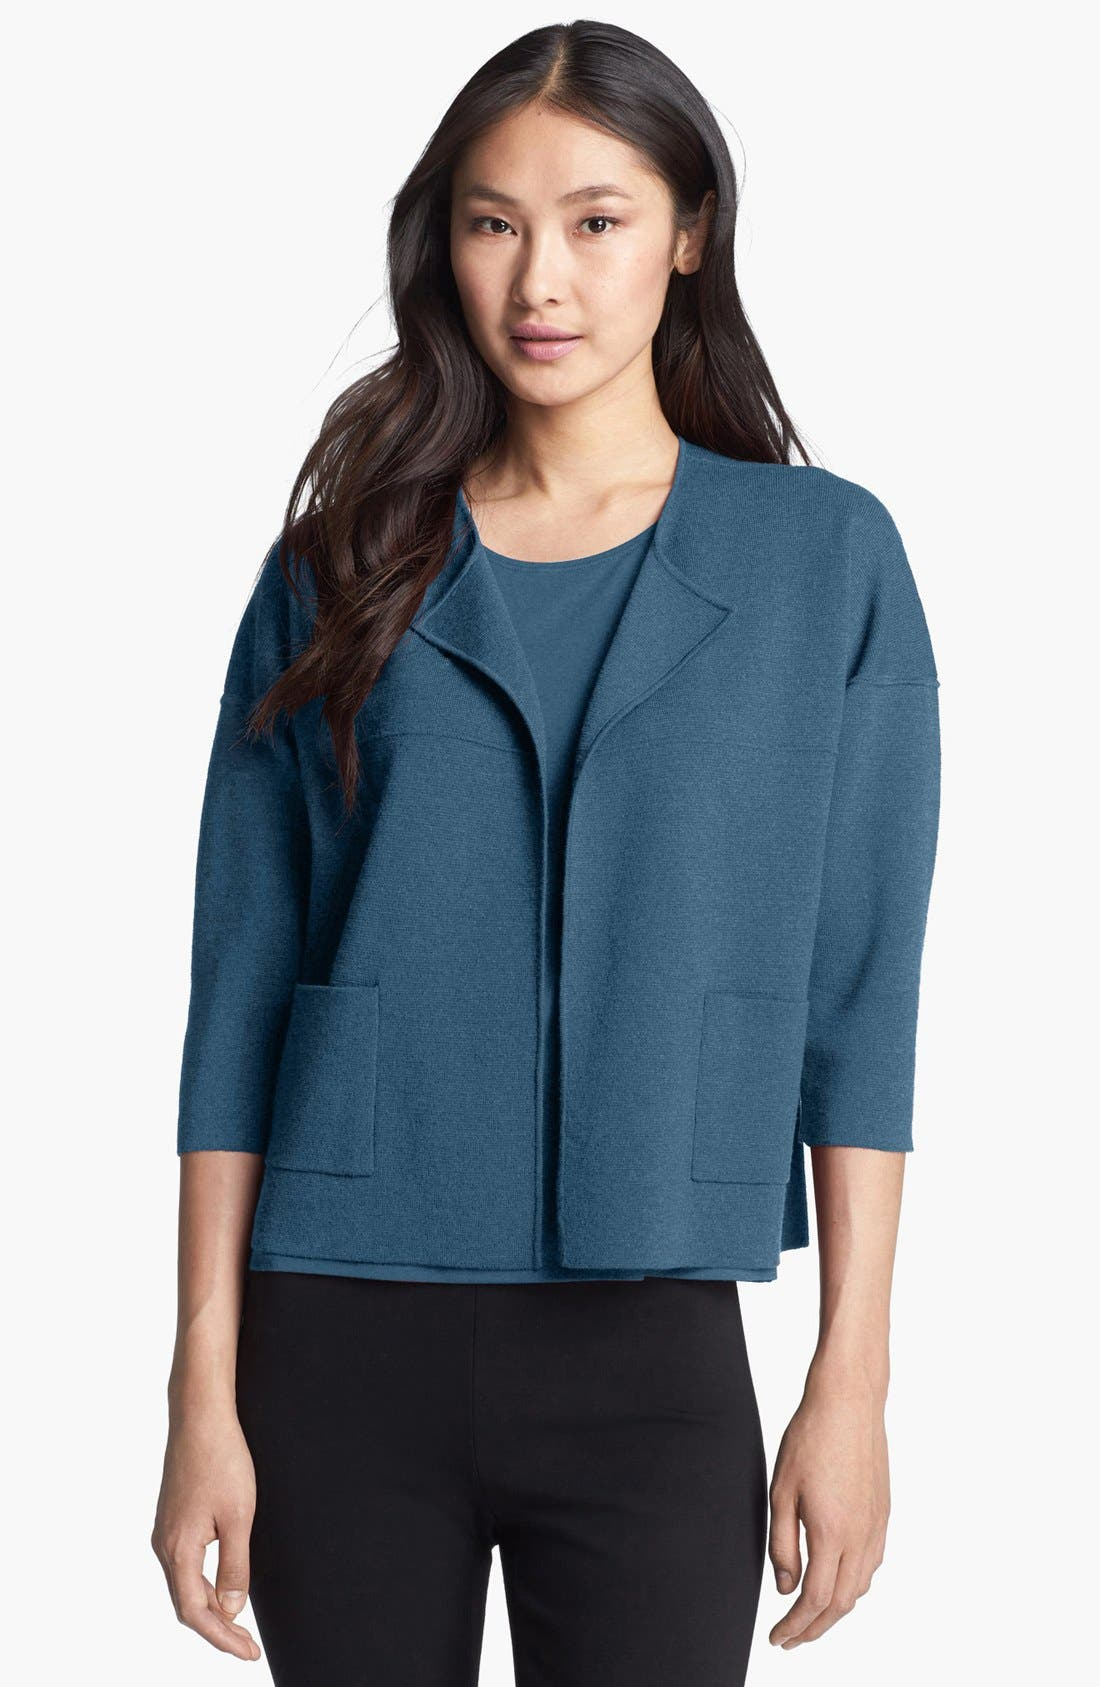 Alternate Image 1 Selected - Eileen Fisher Dolman Sleeve Jacket